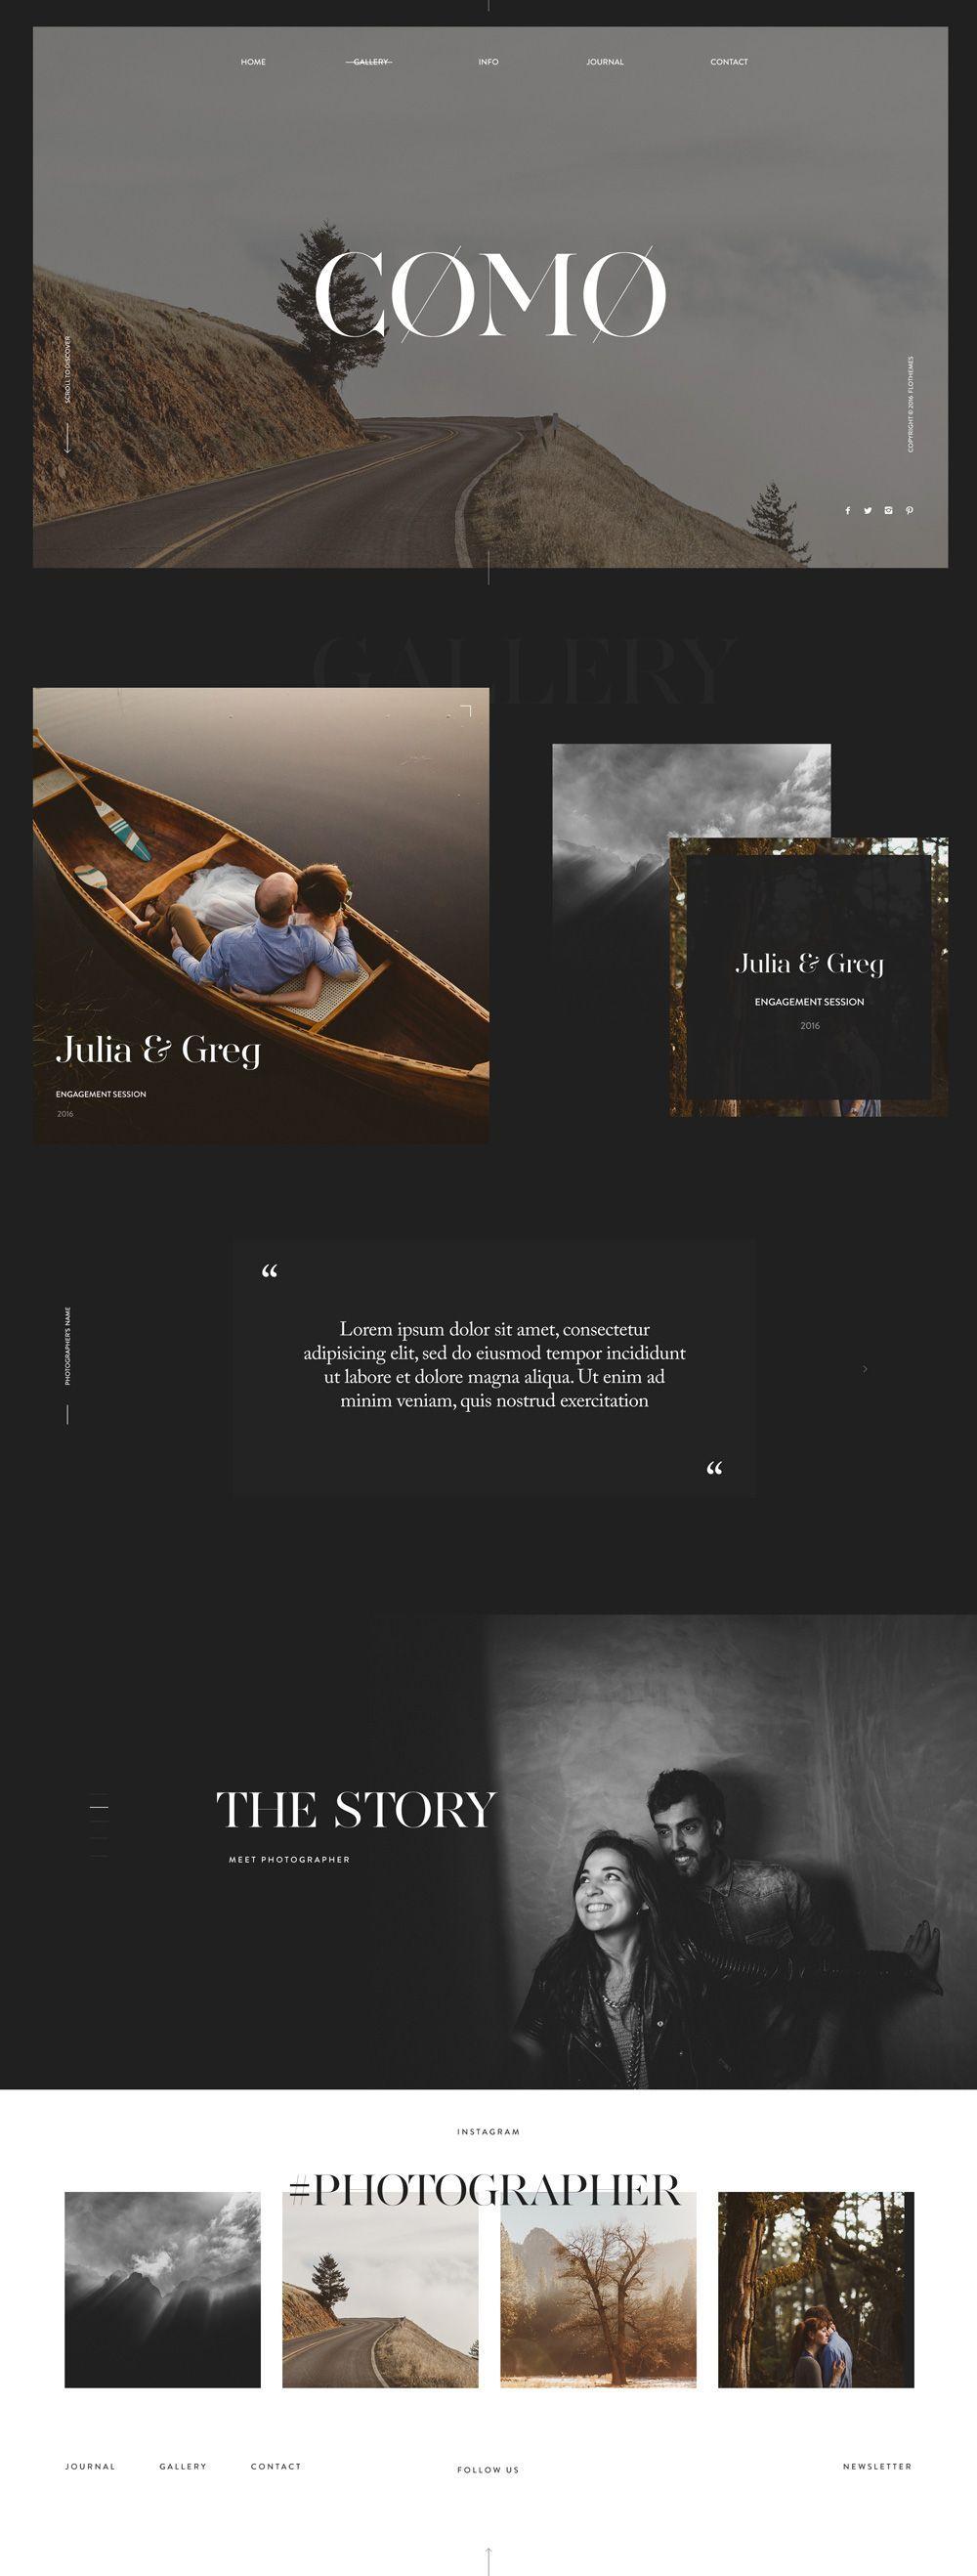 Customizable Photography Website Templates - 2020